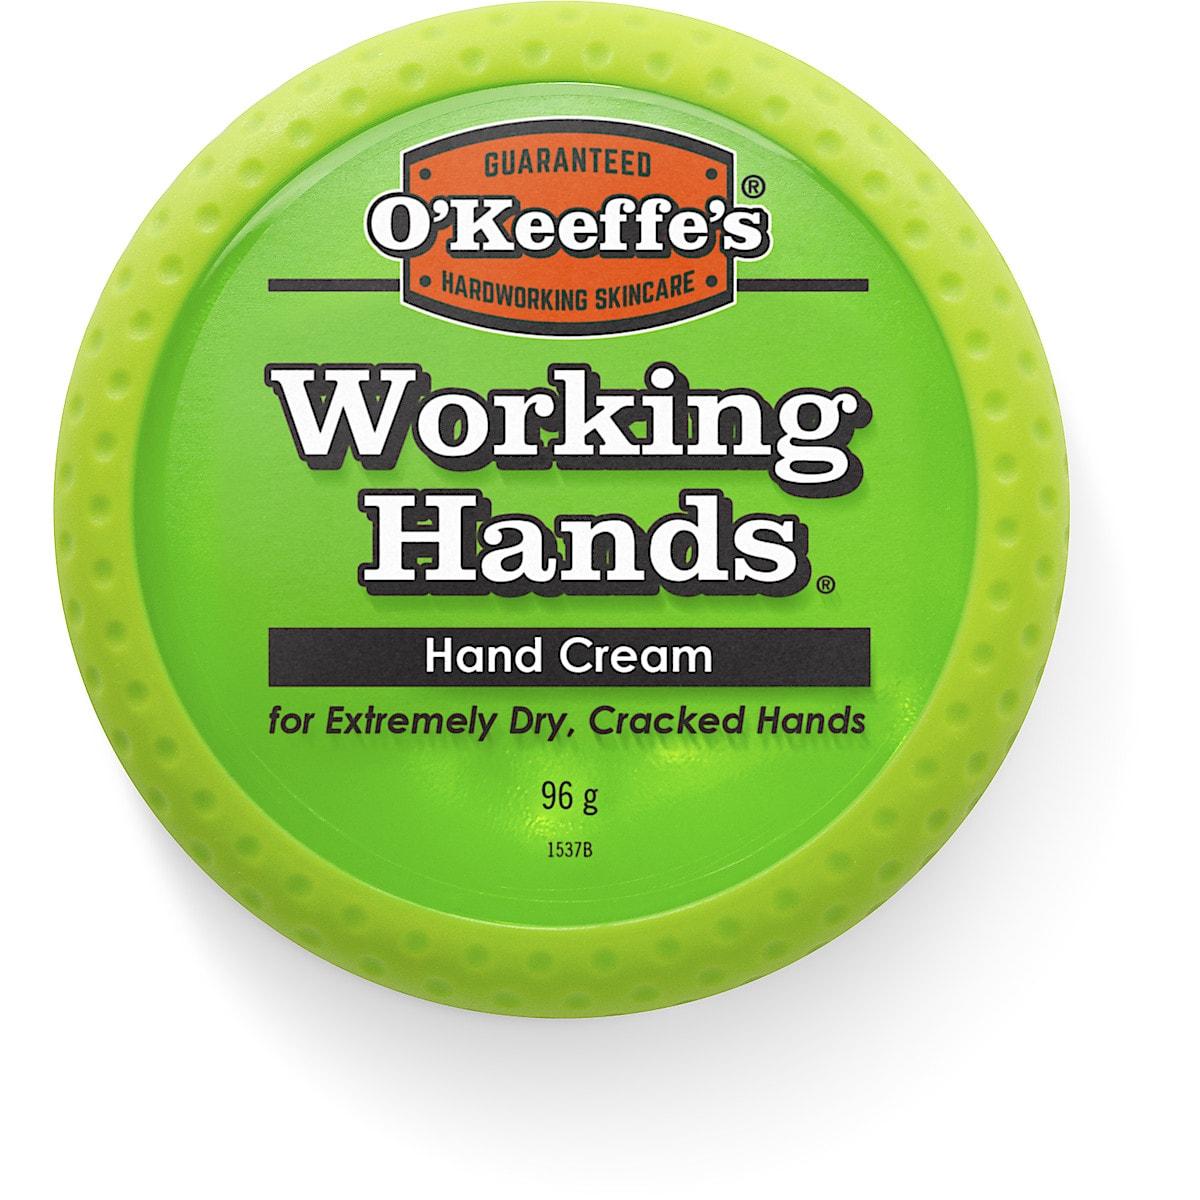 O'Keeffe's håndkrem, Working Hands